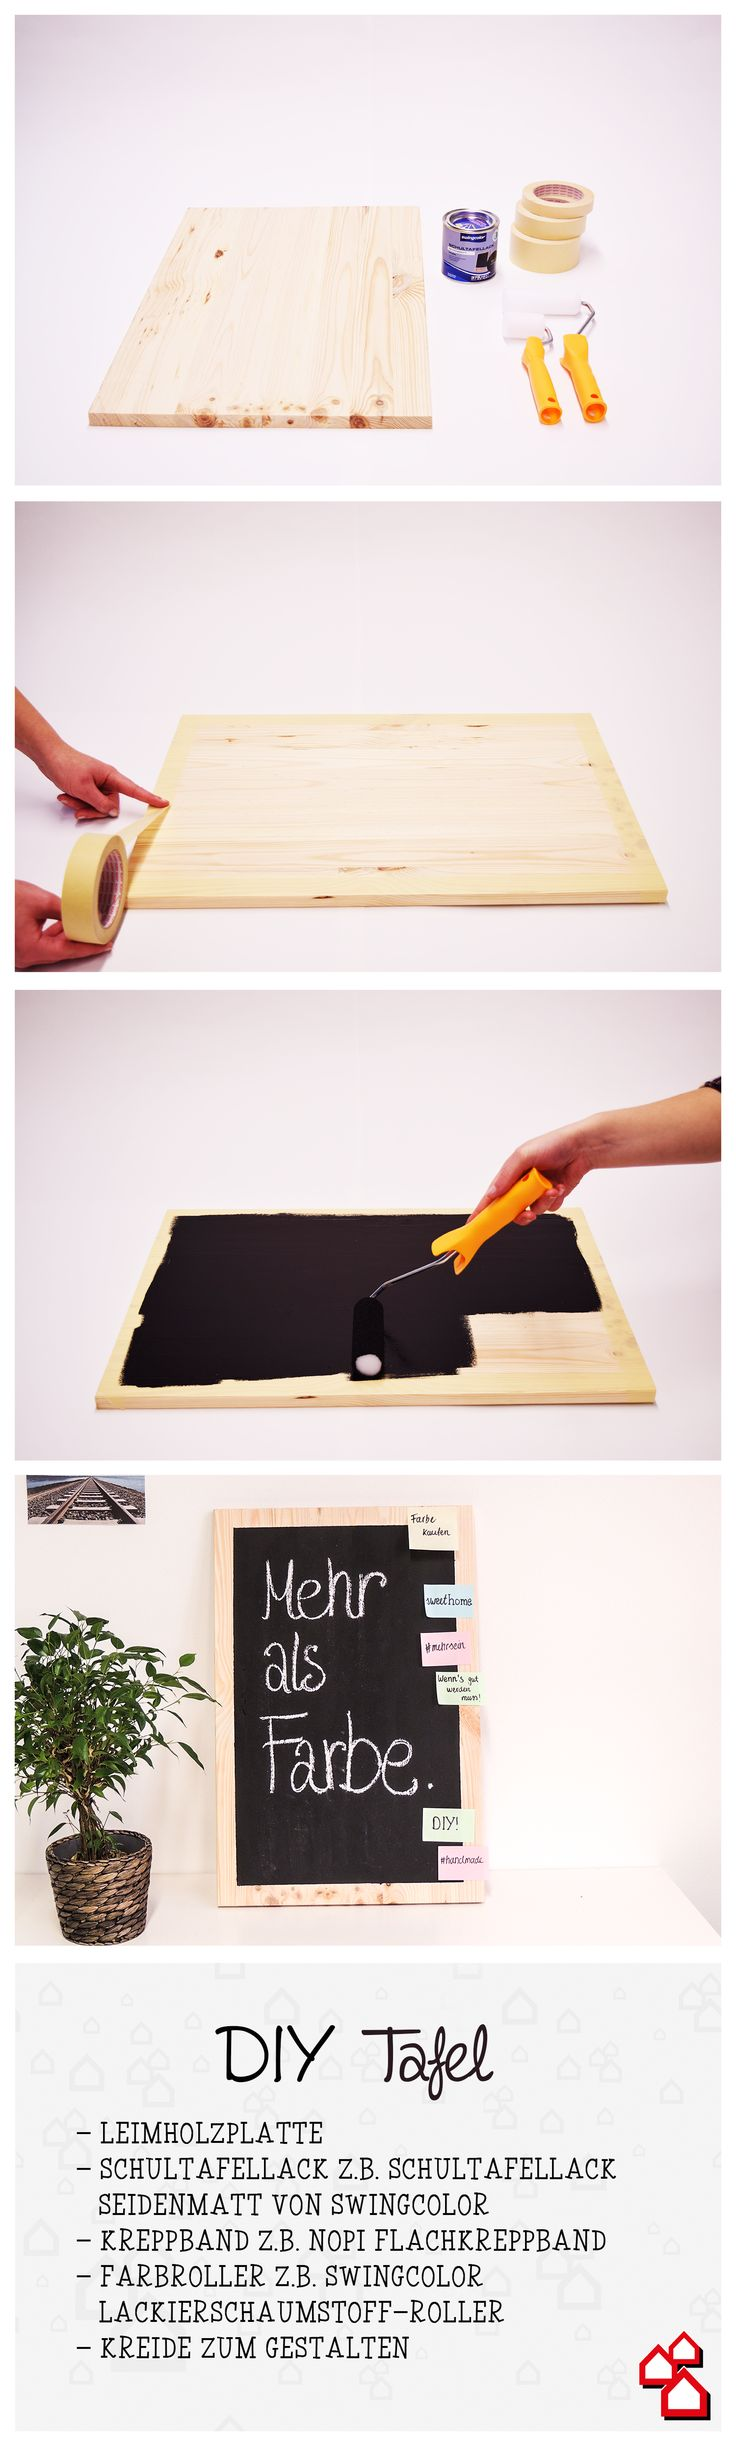 25 best ideas about ps on pinterest photoshop 4. Black Bedroom Furniture Sets. Home Design Ideas